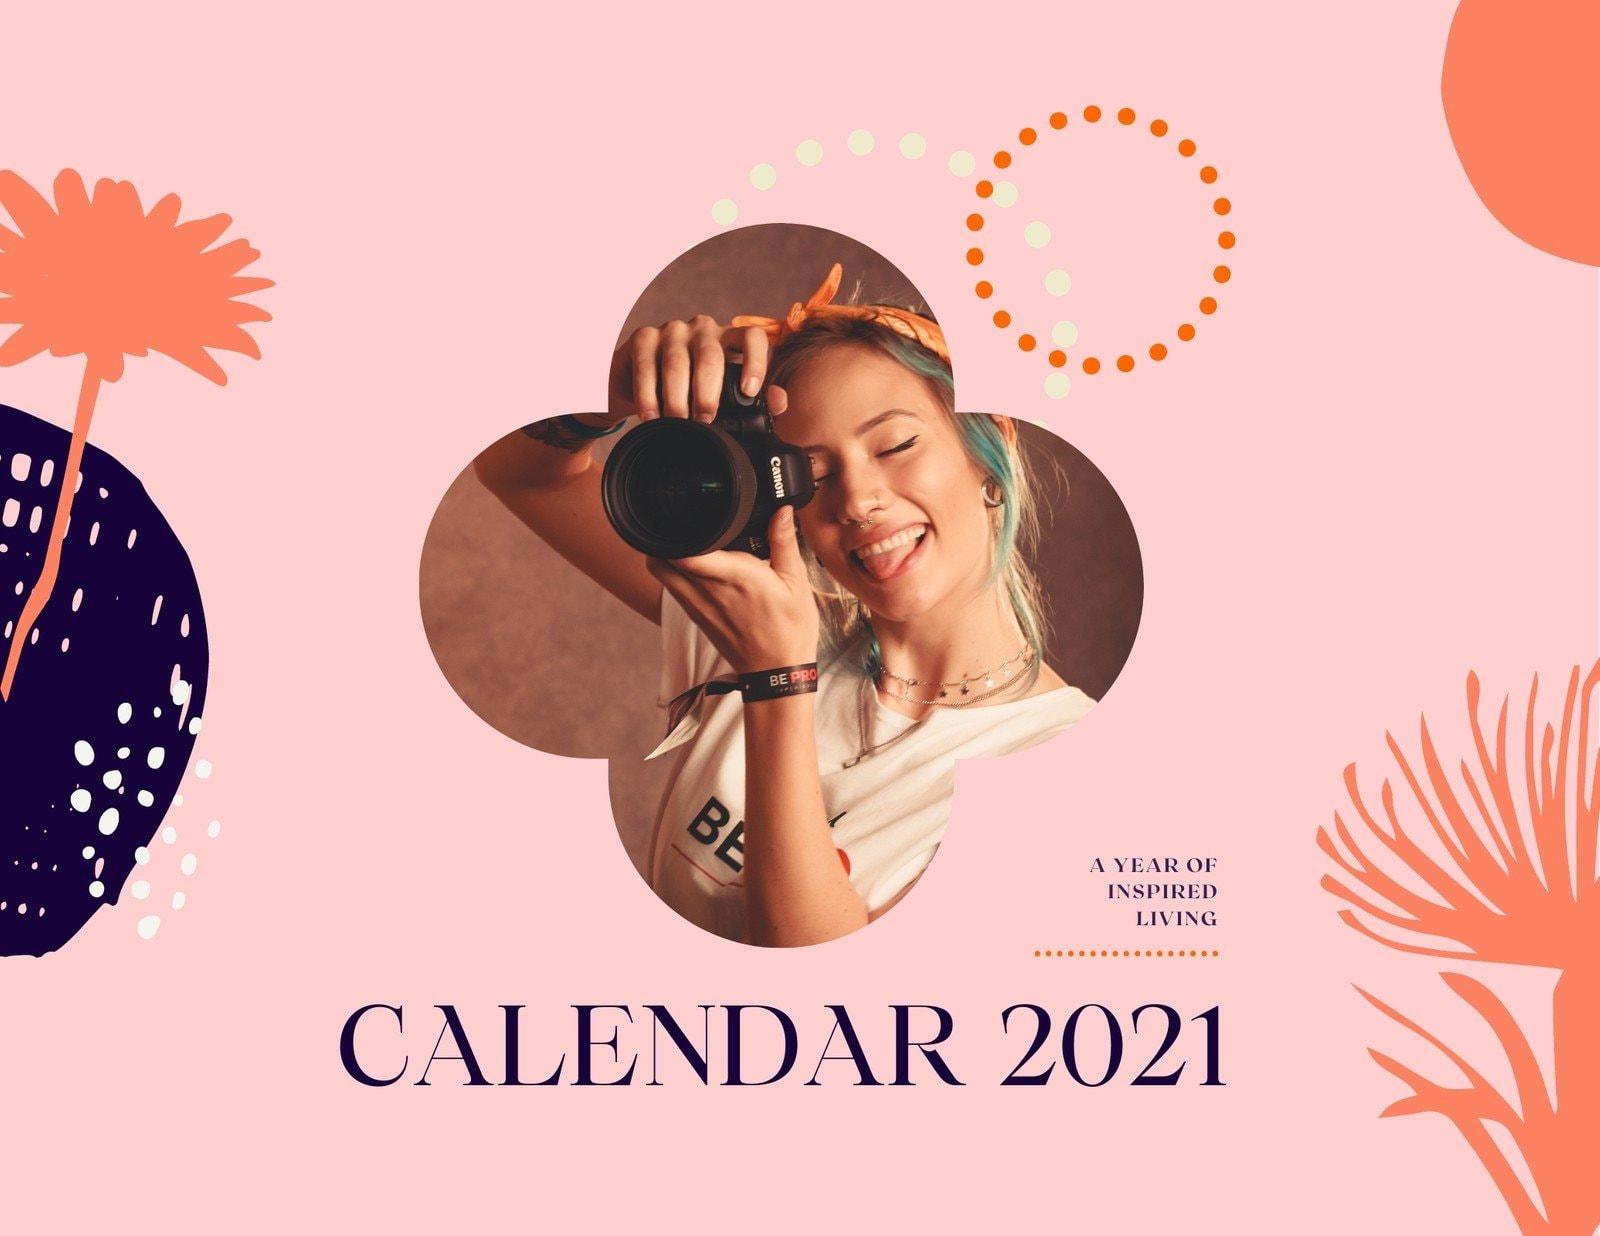 Pink Orange and Violet Handmade Organic Woman Wall Calendar